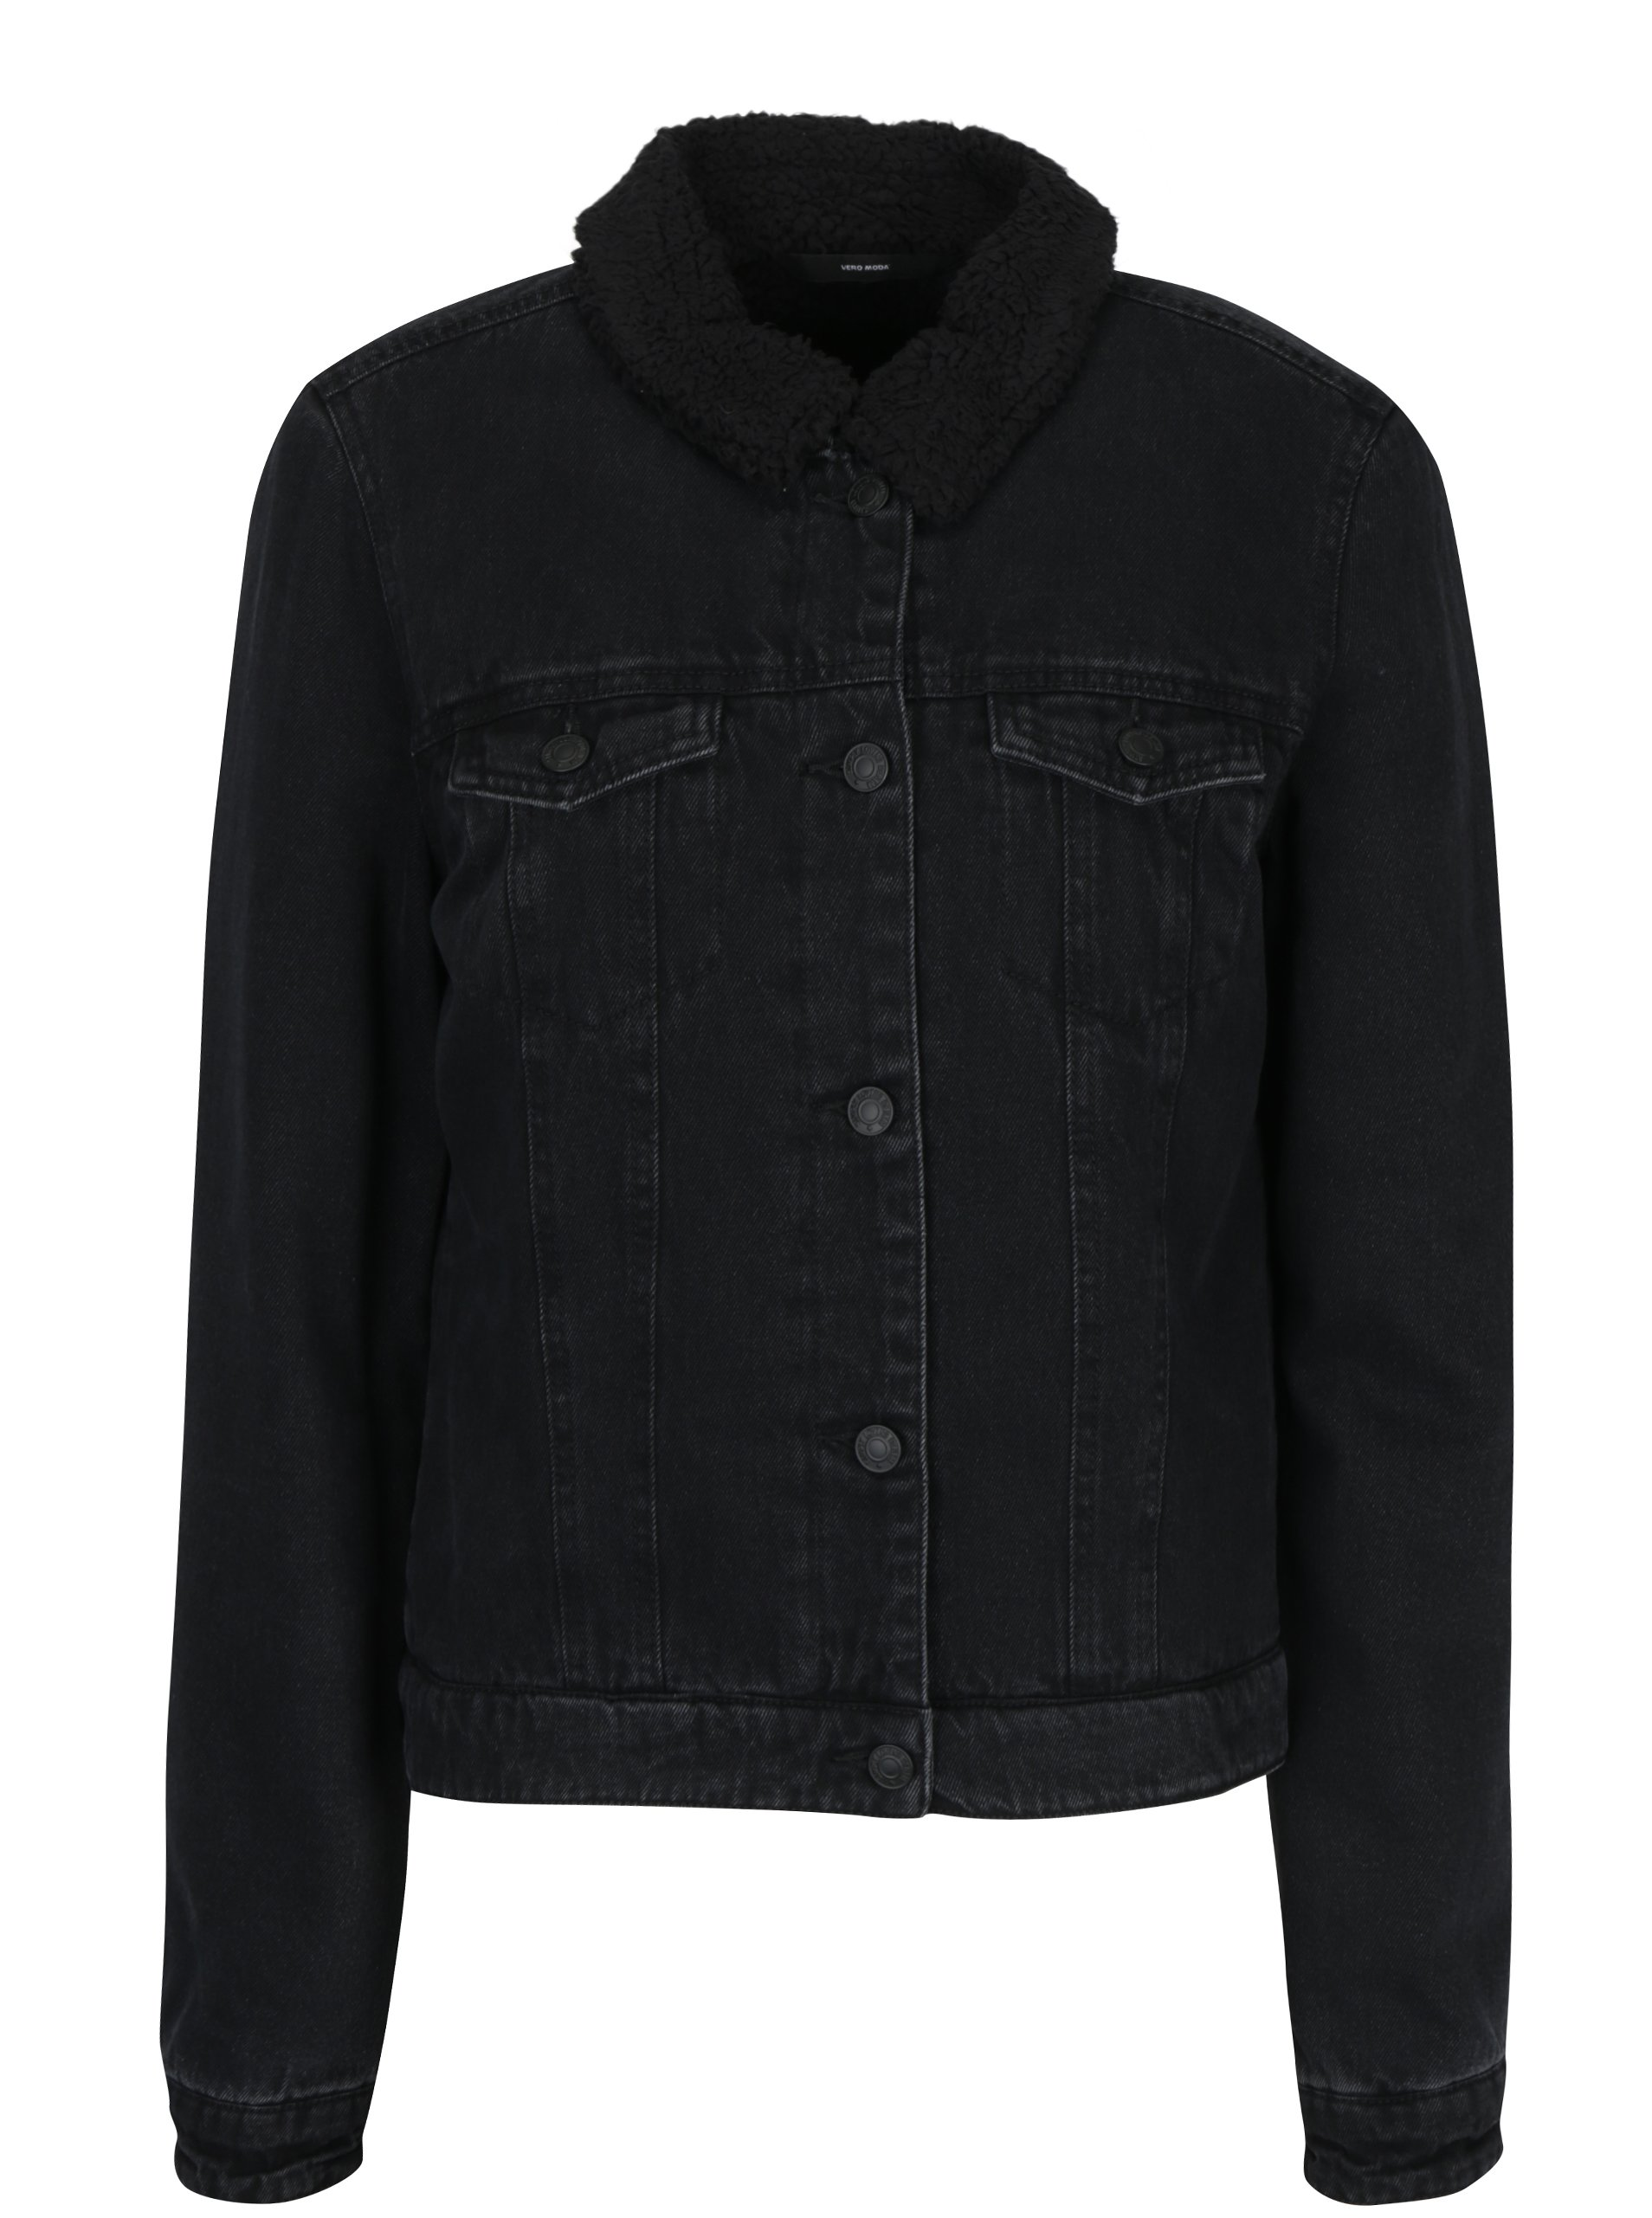 Černá džínová bunda s umělým kožíškem VERO MODA Tine